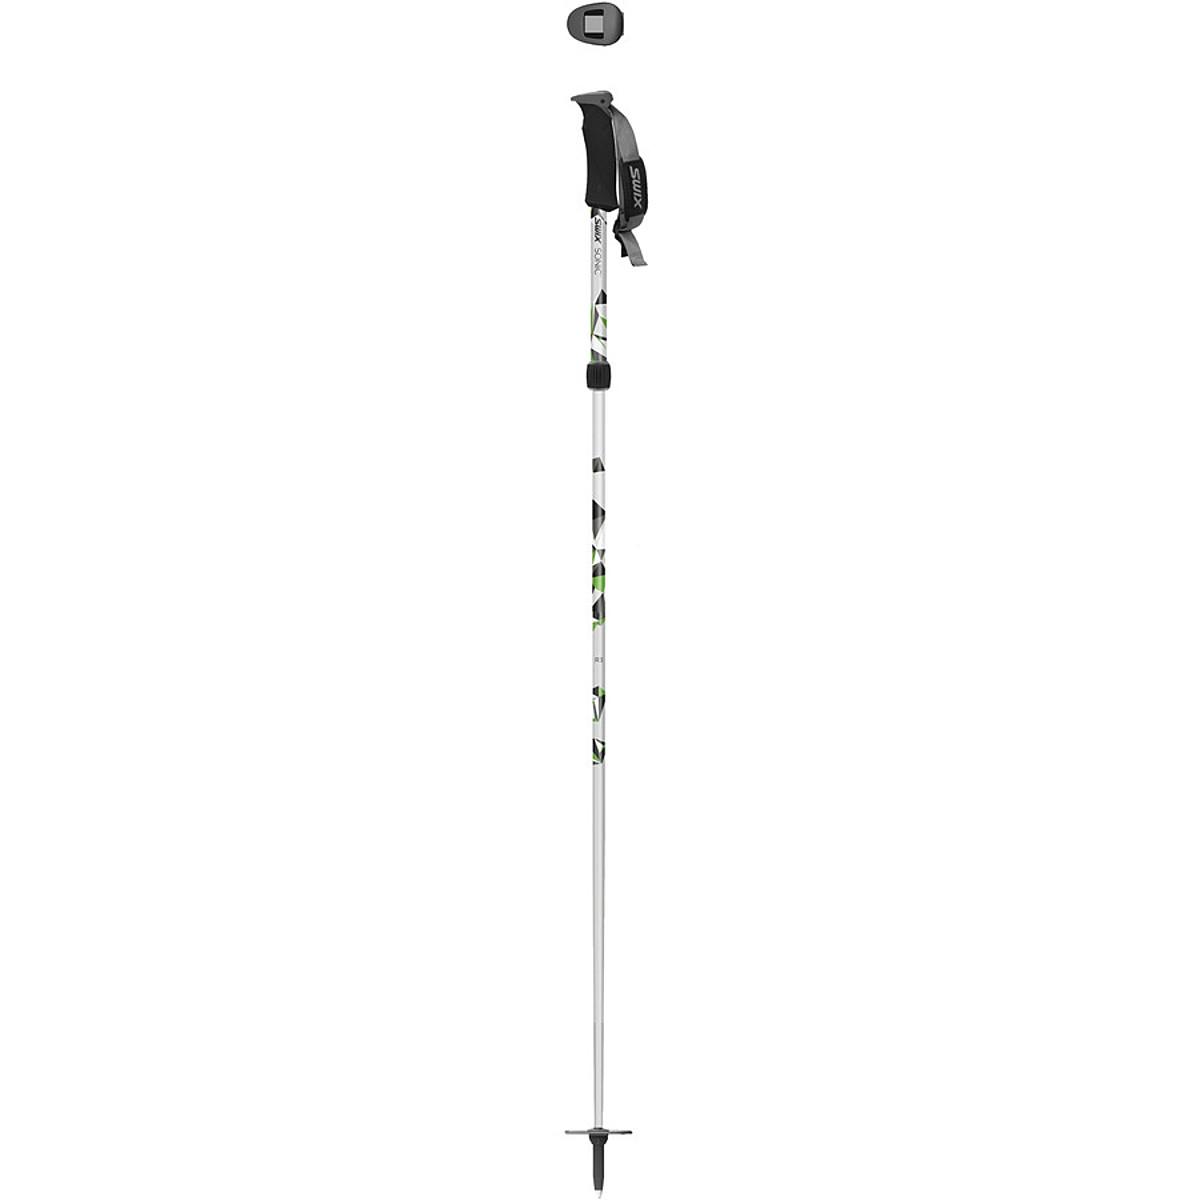 photo: Swix Sonic R3 Aluminum Ski Poles nordic touring pole